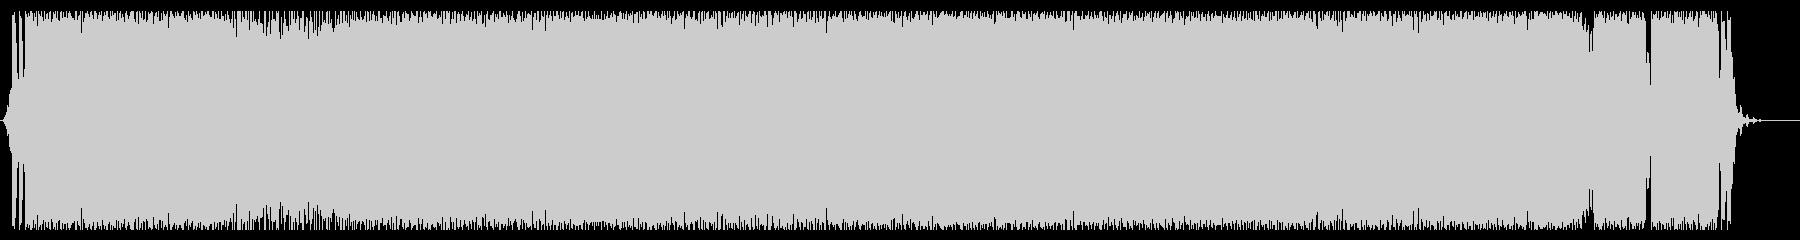 RPGの戦闘シーンの様なBGMの未再生の波形